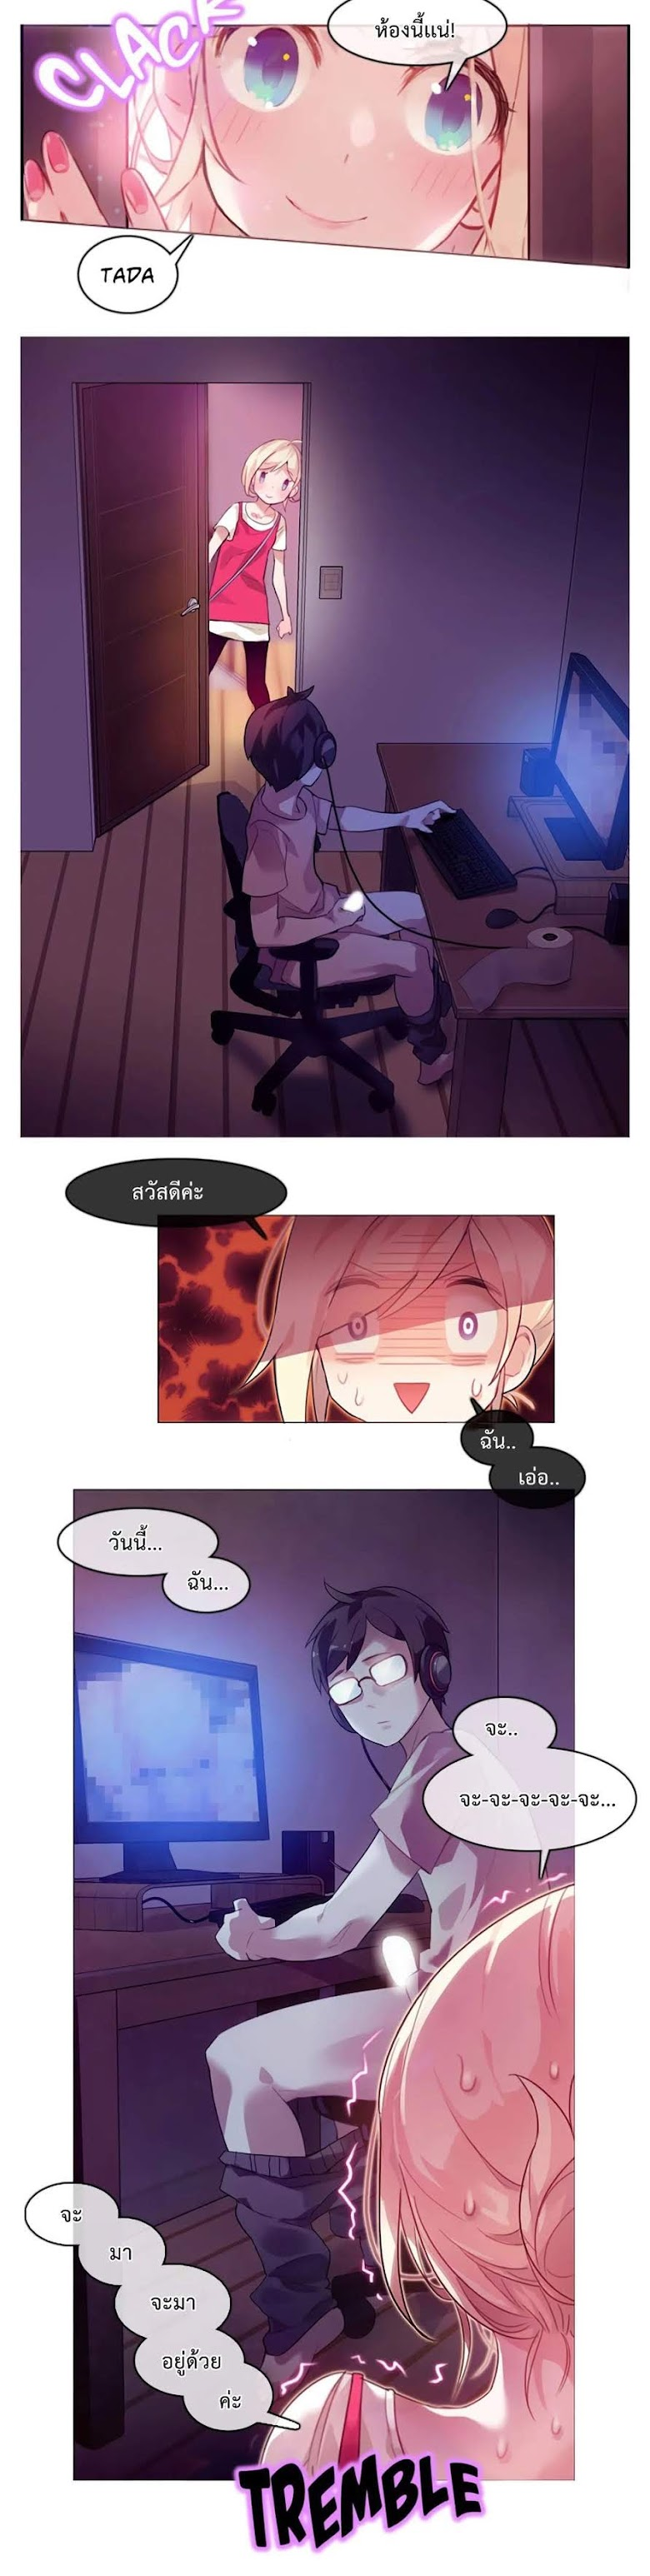 A Pervert s Daily Life - หน้า 4